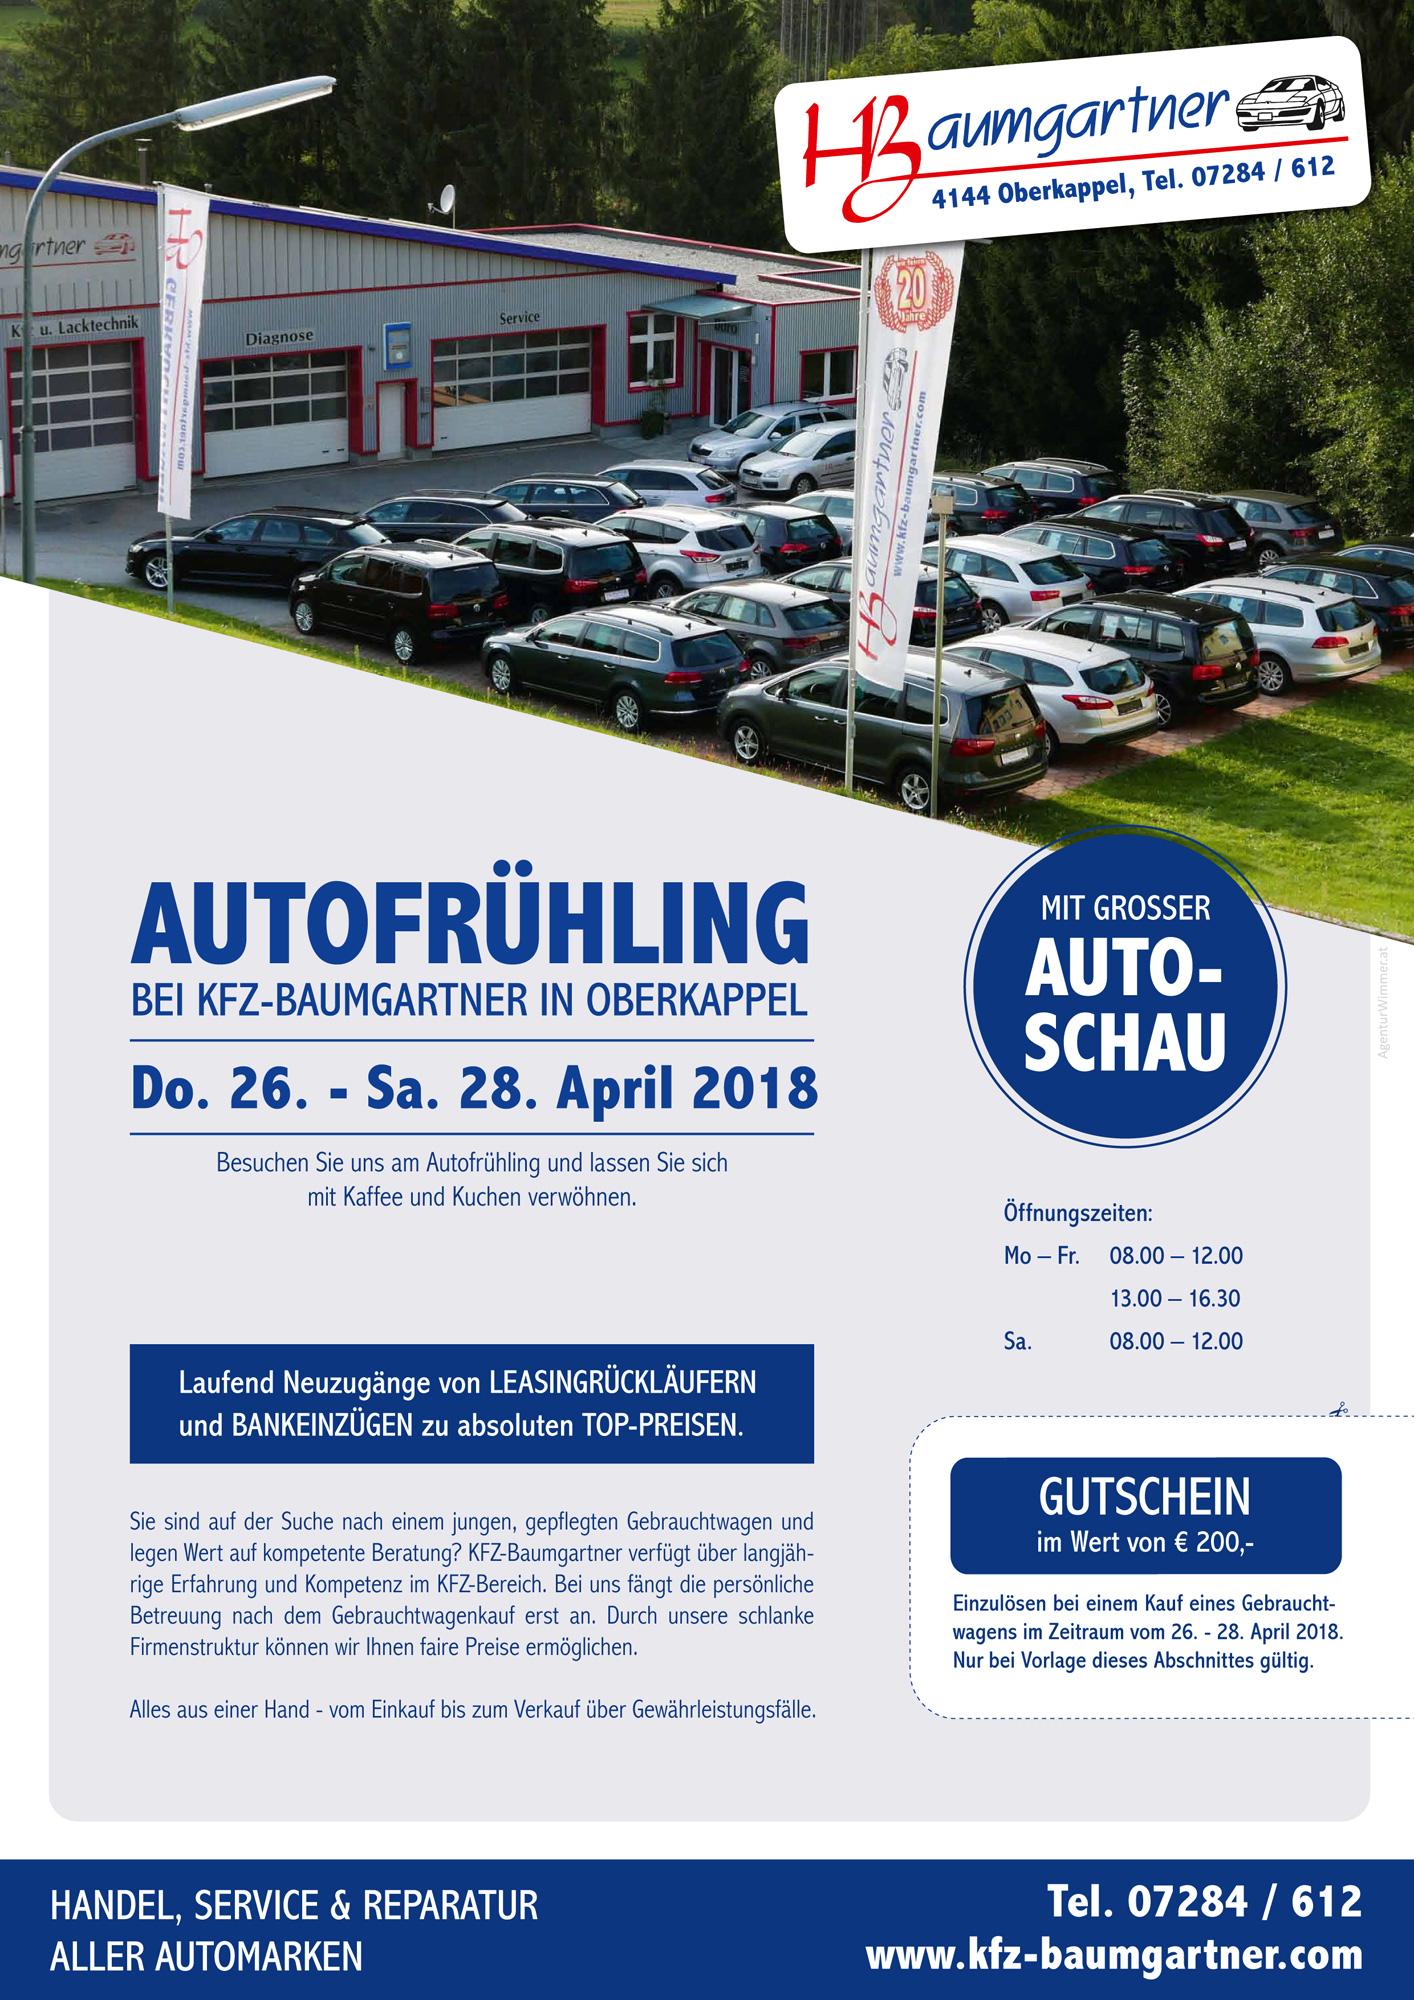 KFZ Baumgartner Autofrühling 2018